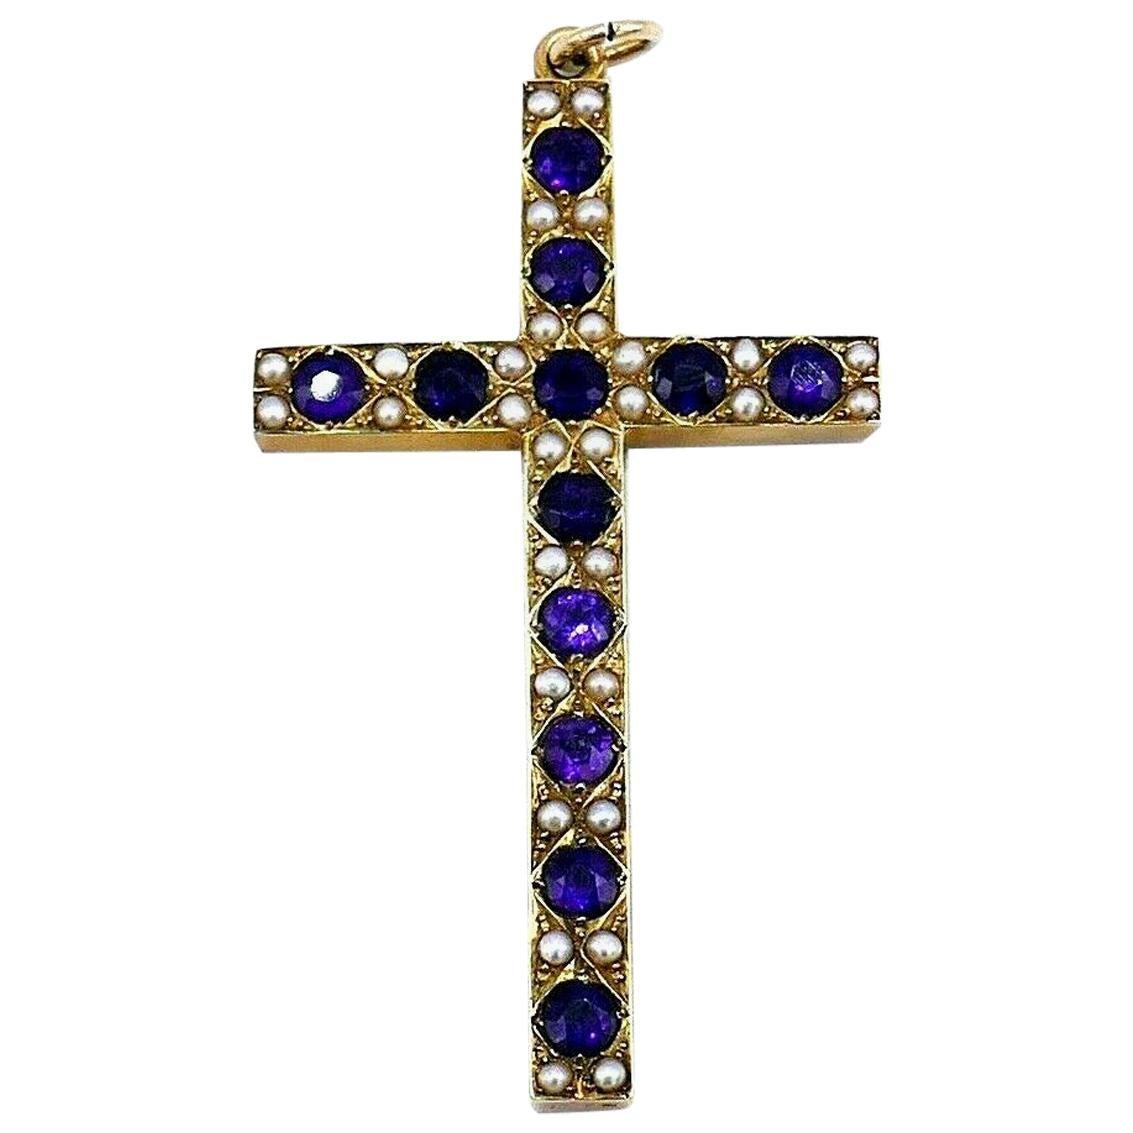 Victorian 14 Karat Yellow Gold Amethyst Pearl Cross Pendant